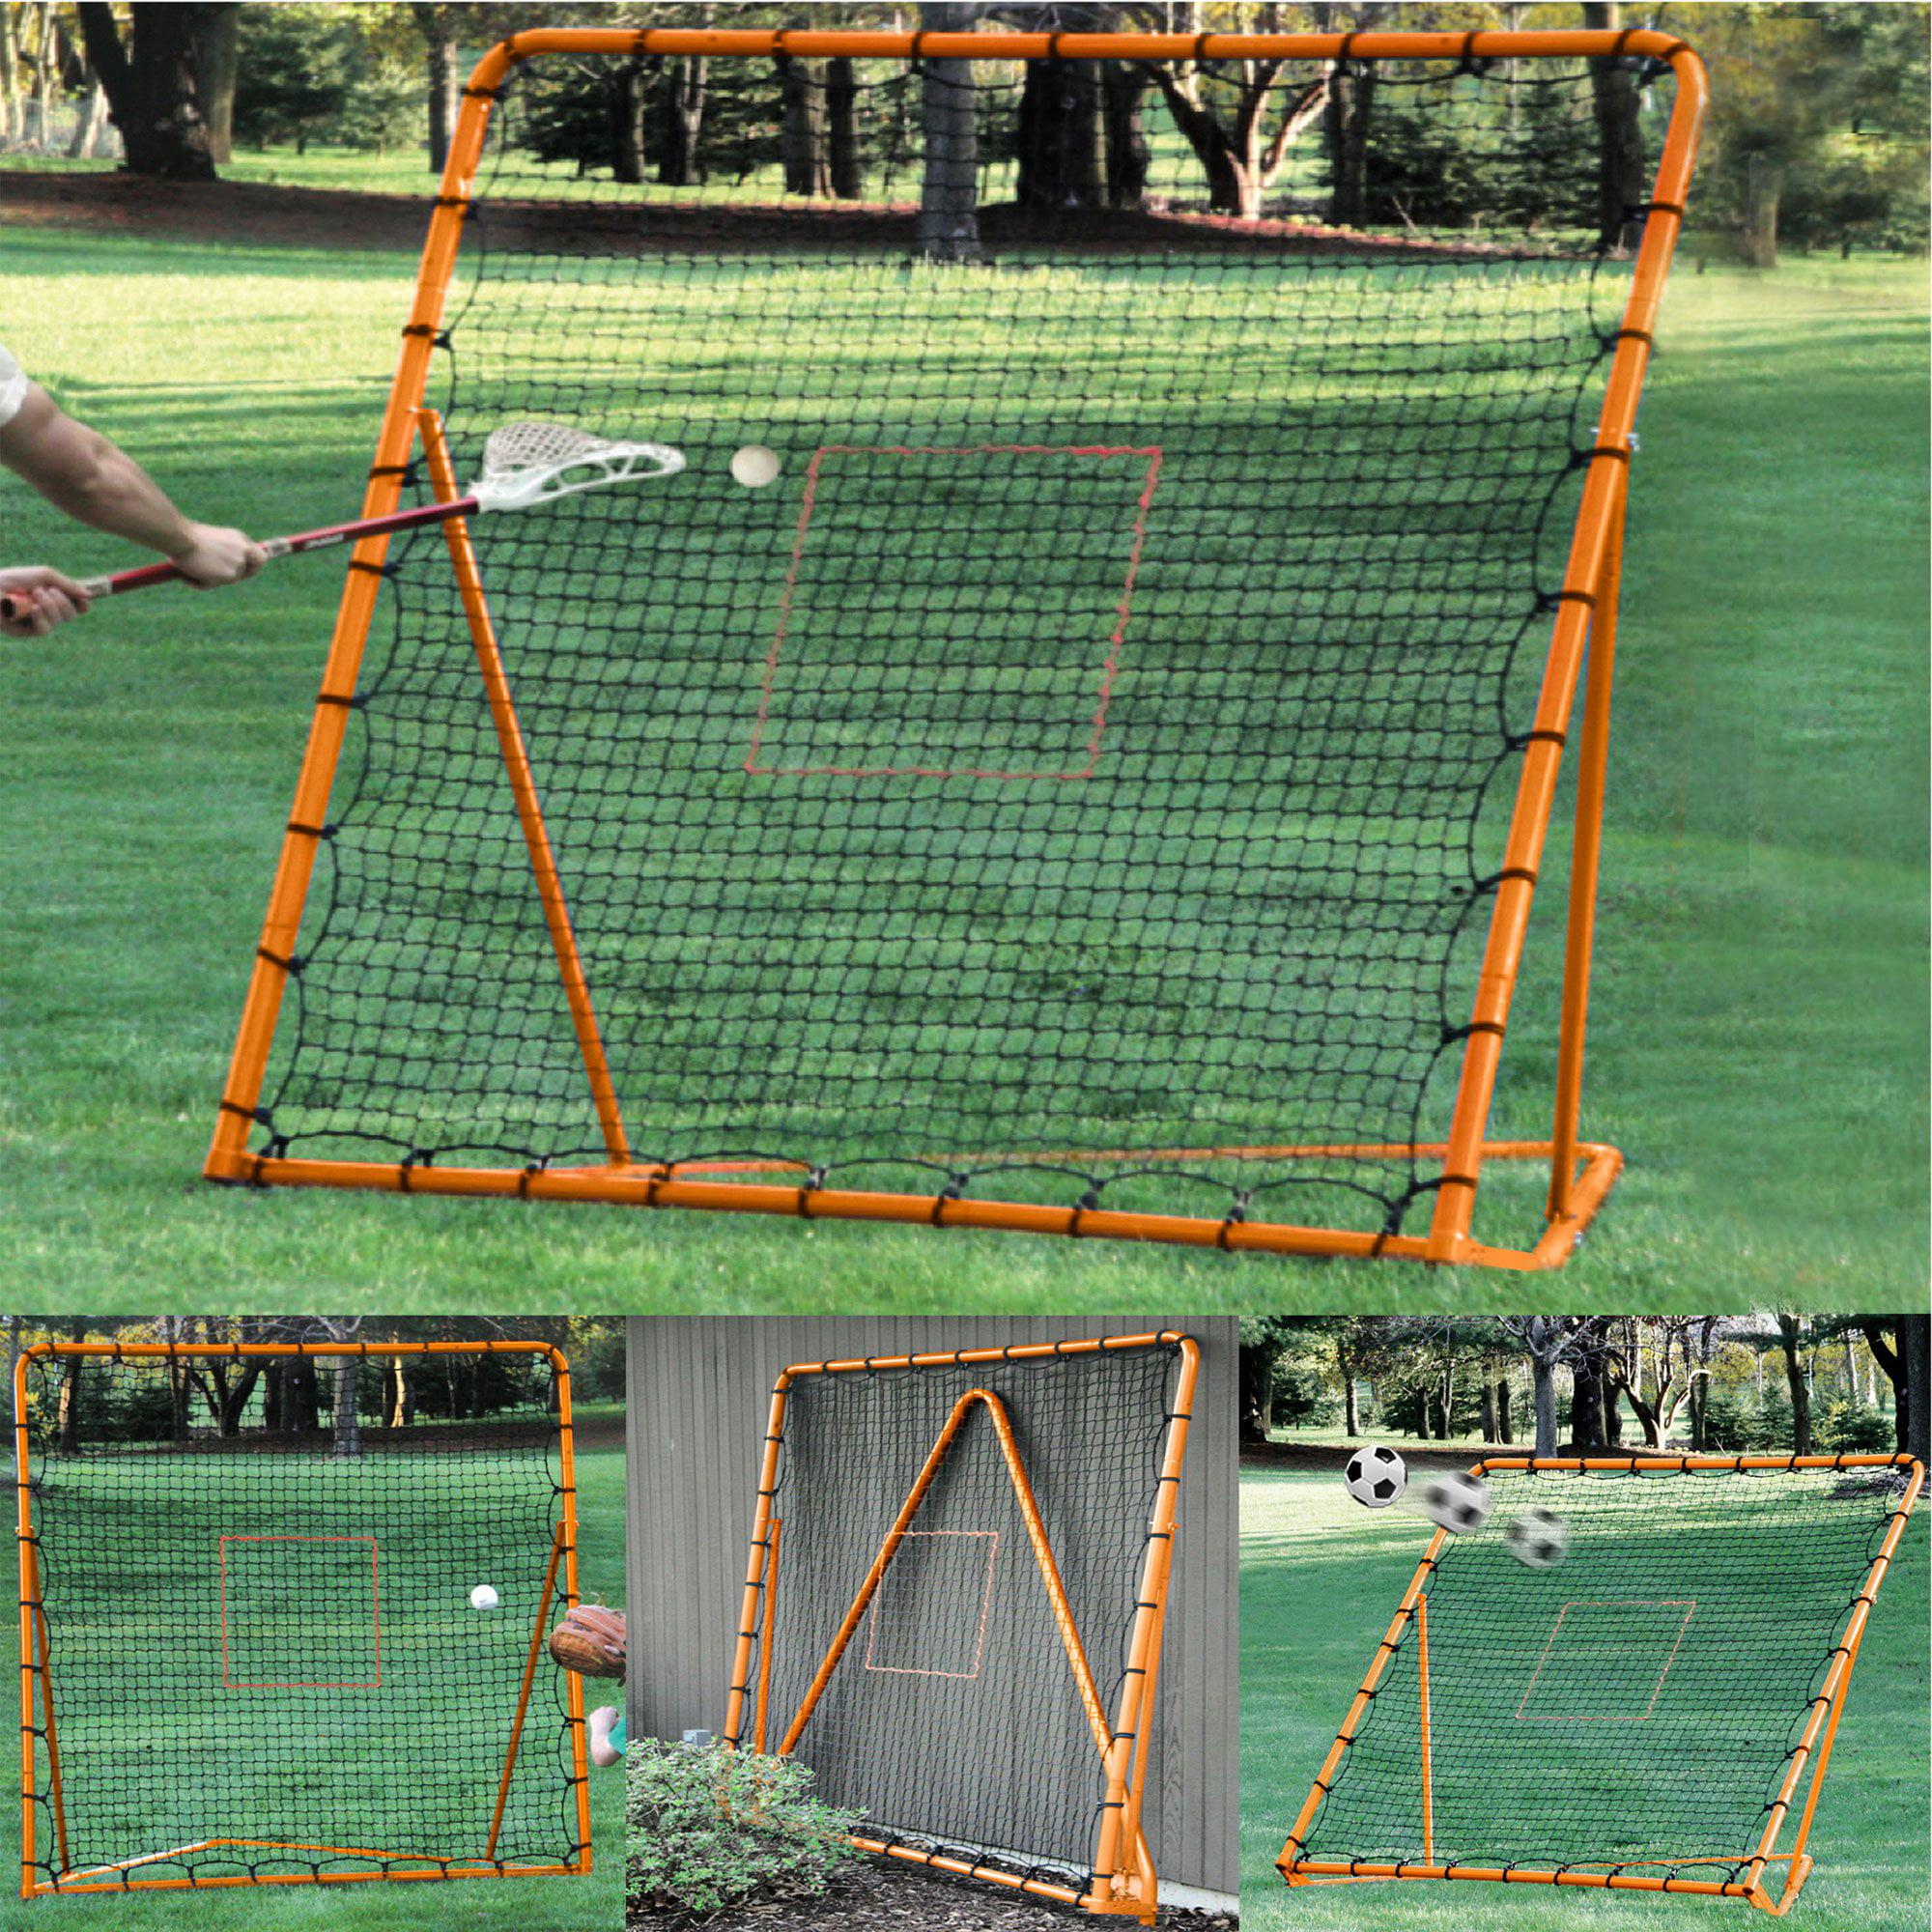 EZ Goal Lacrosse Practice Rebounder